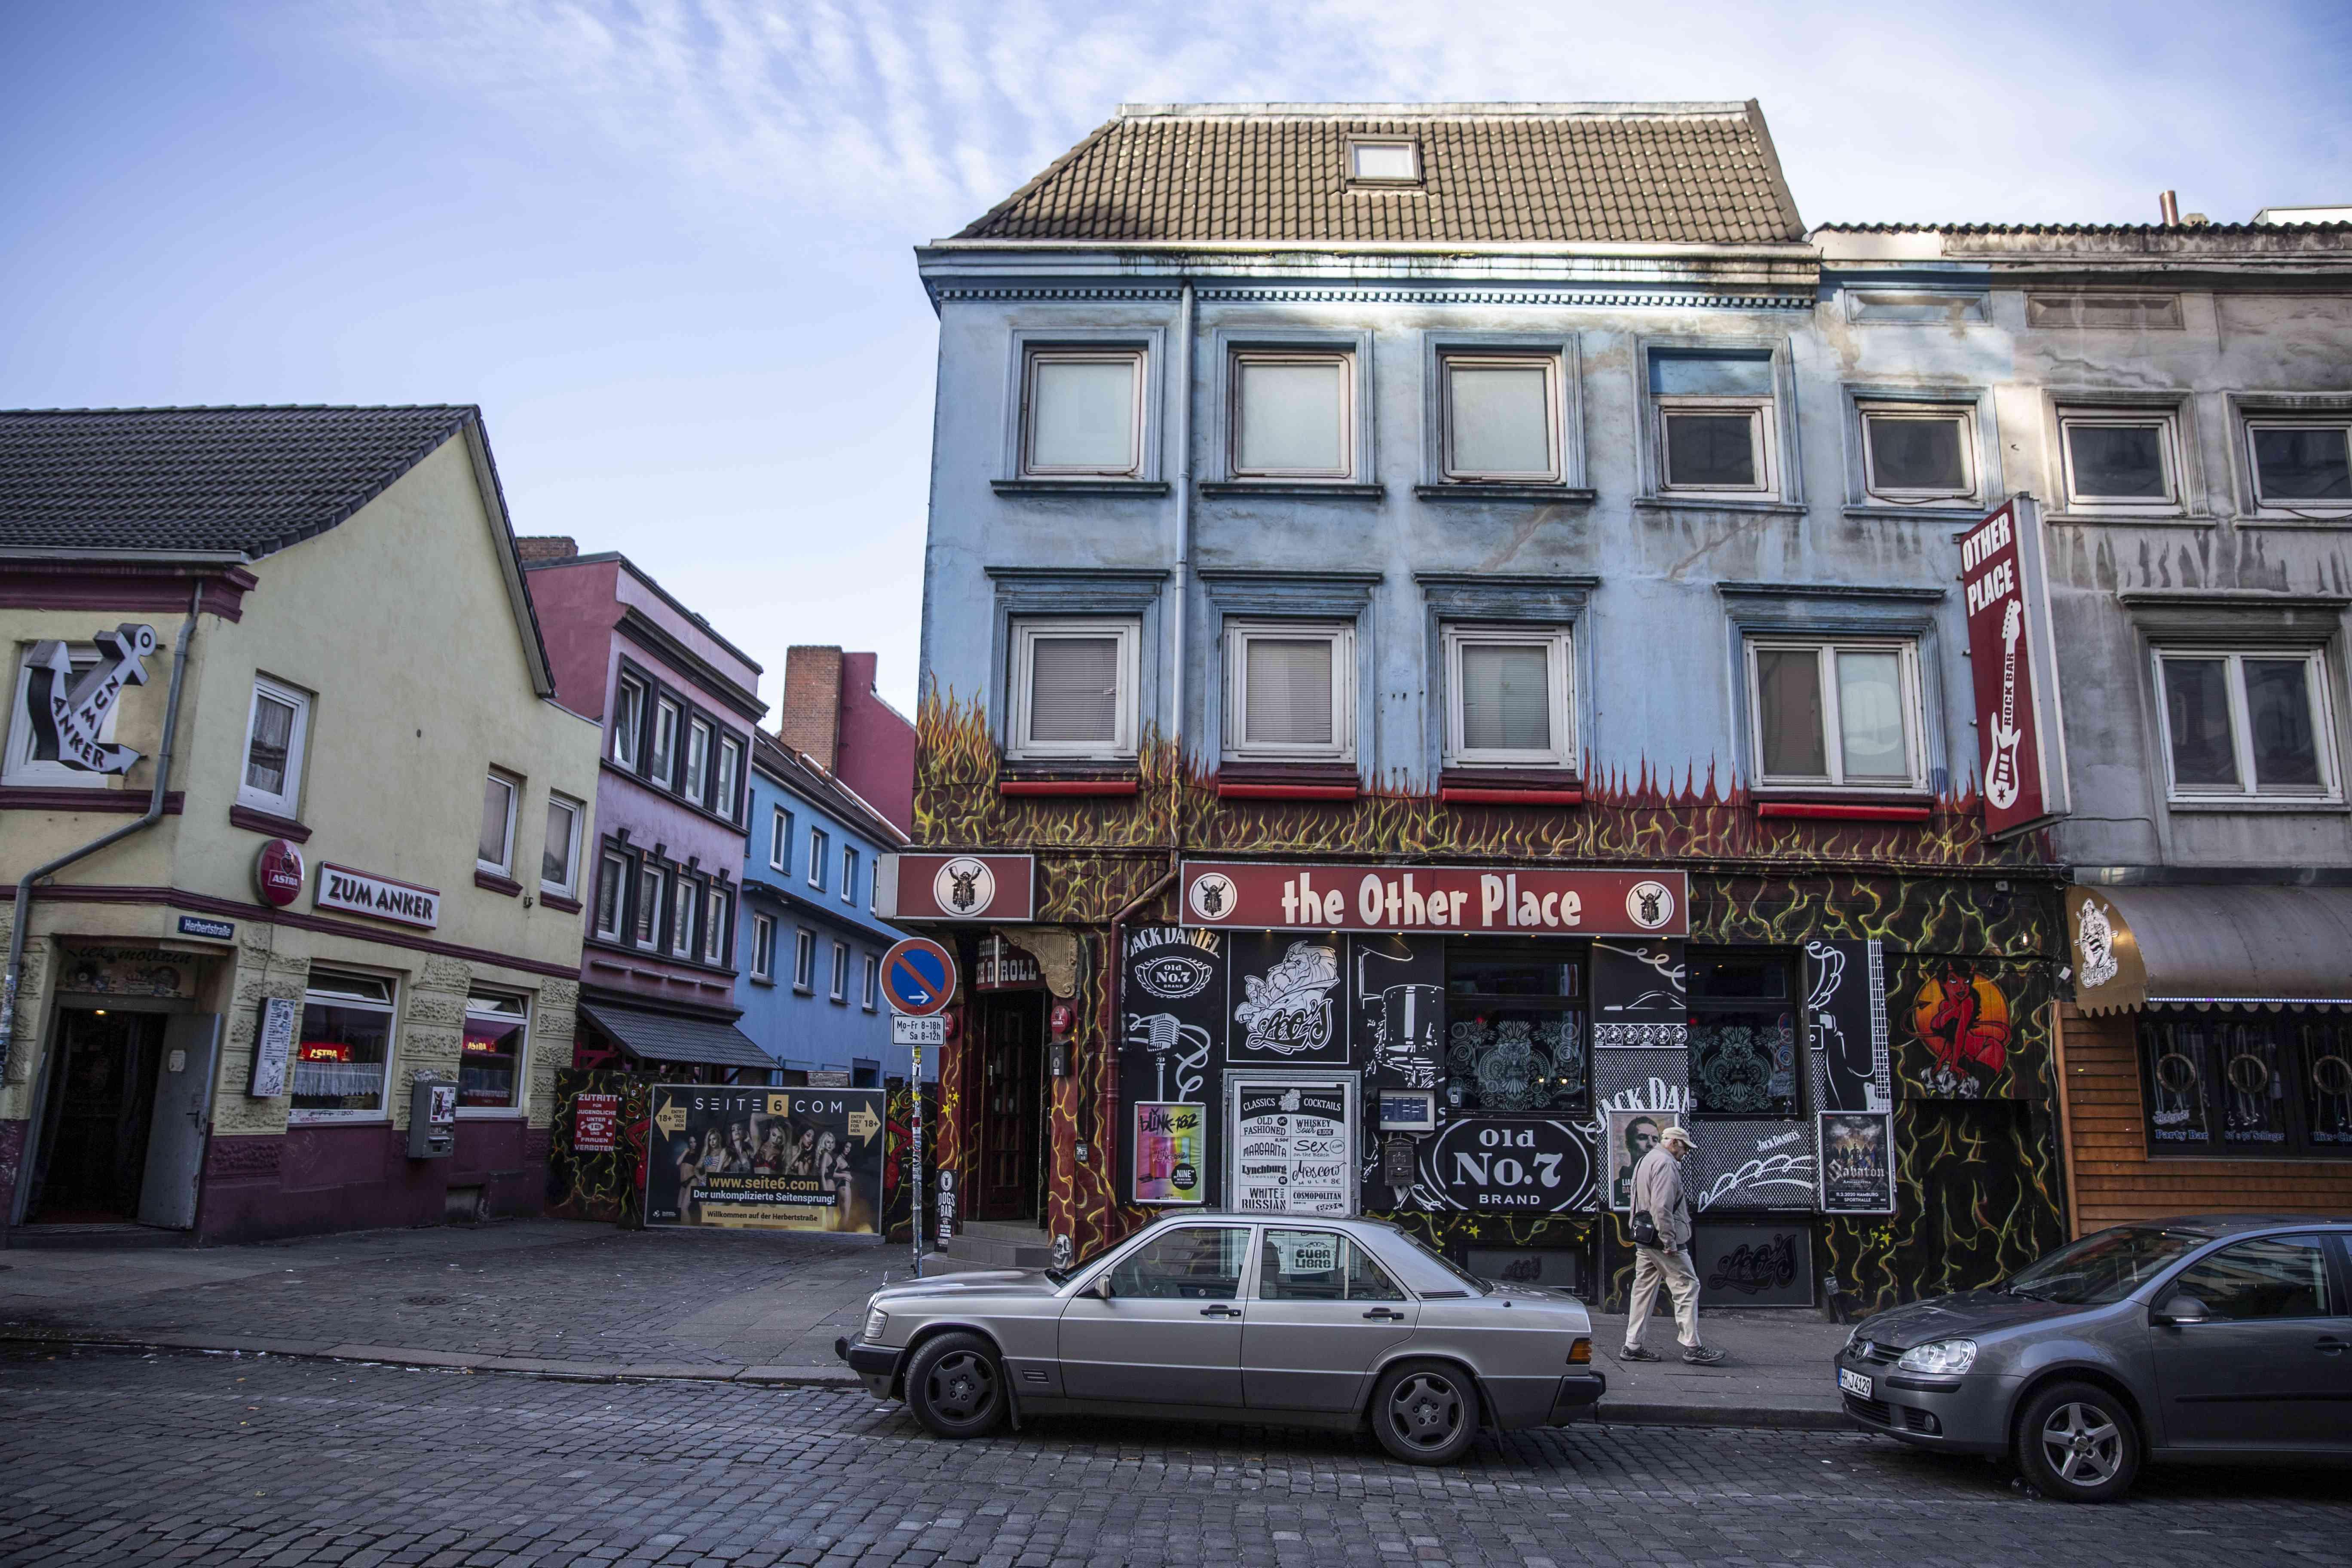 Grungy dive bars on the Reeperbahn